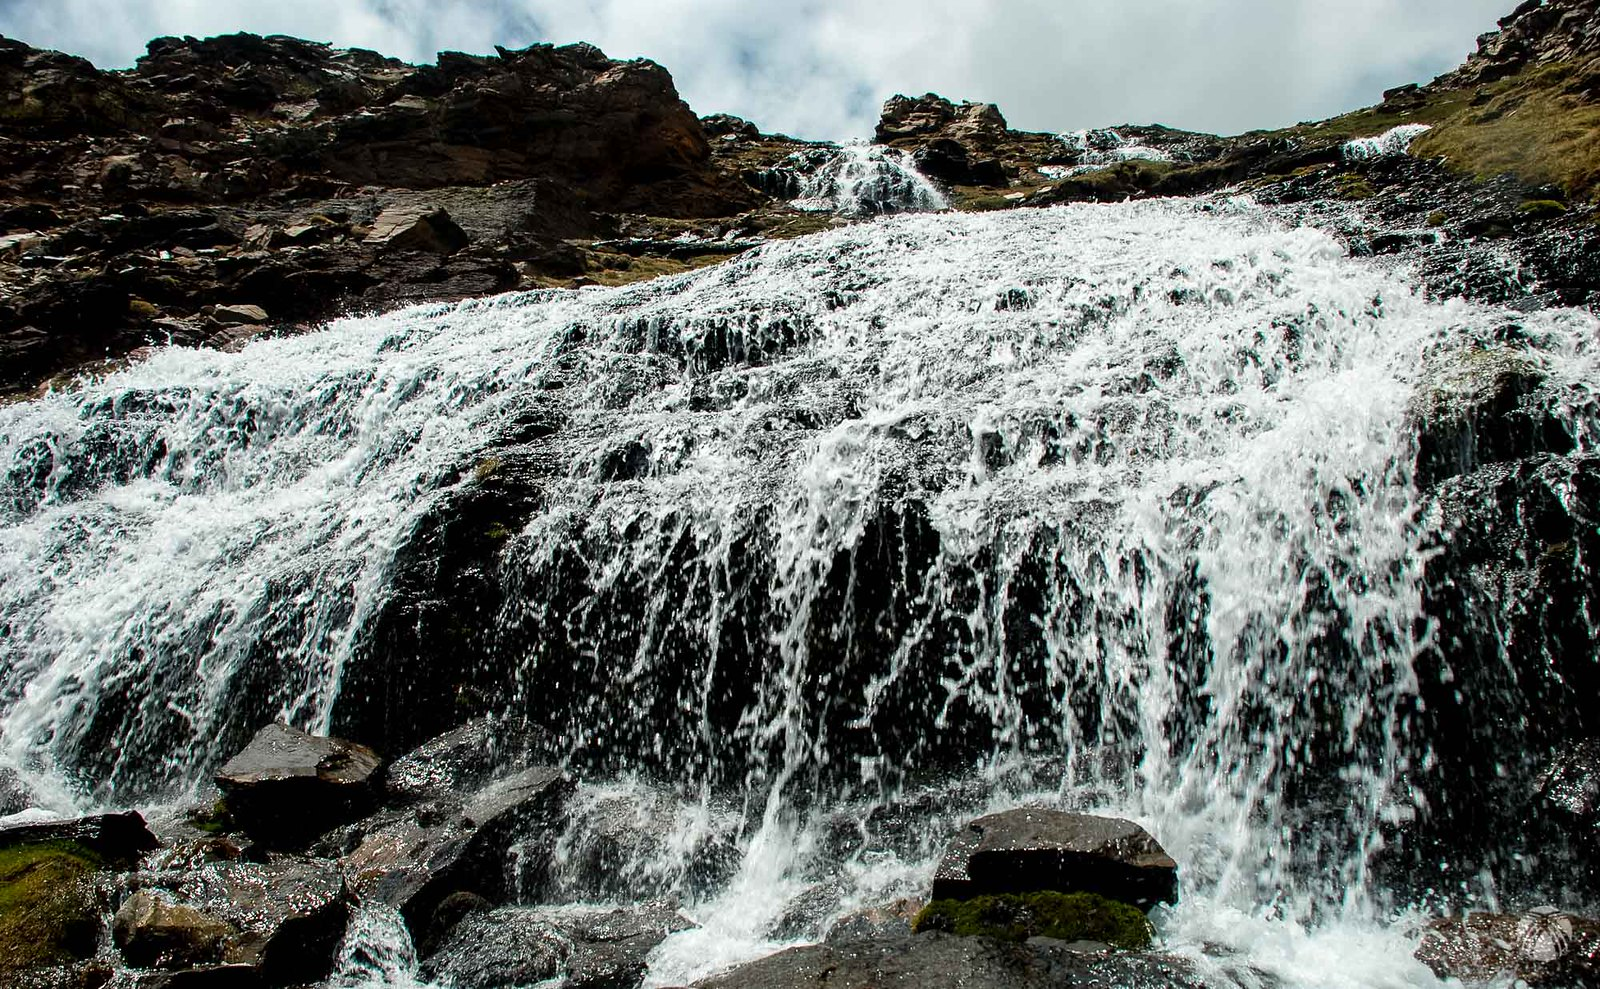 Maravilla de agua